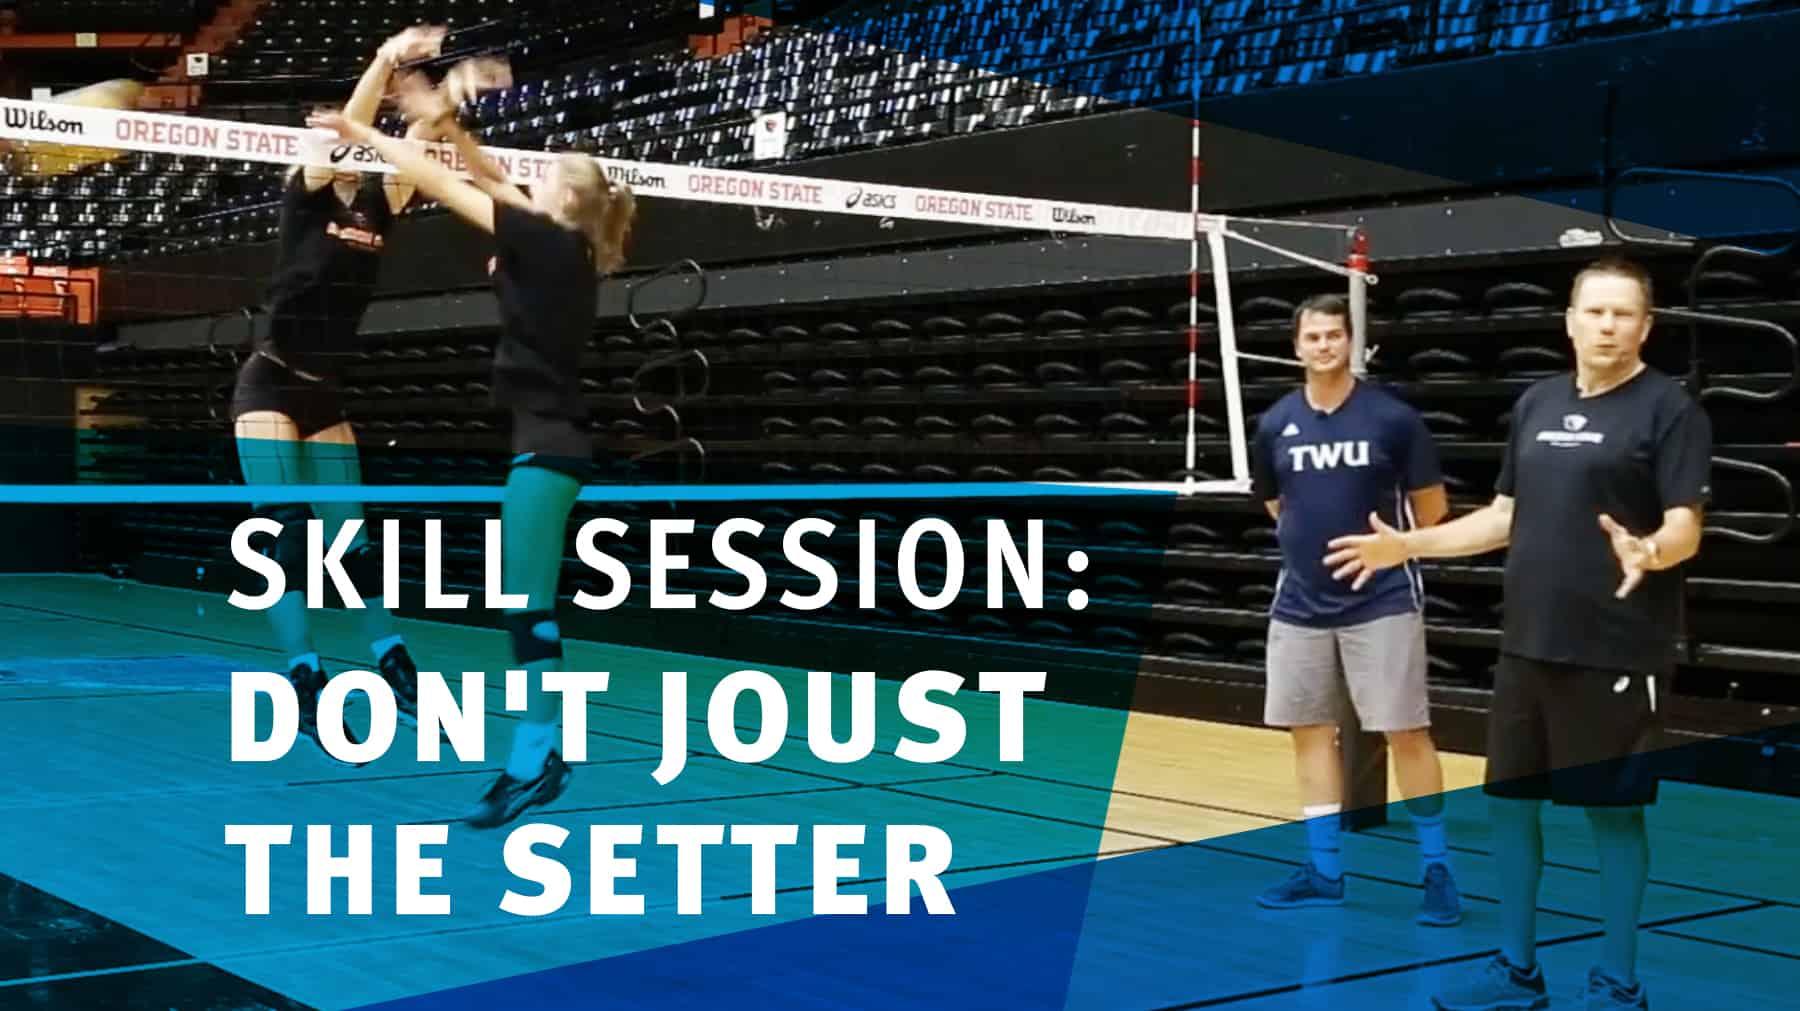 Skill Session Don T Joust The Setter